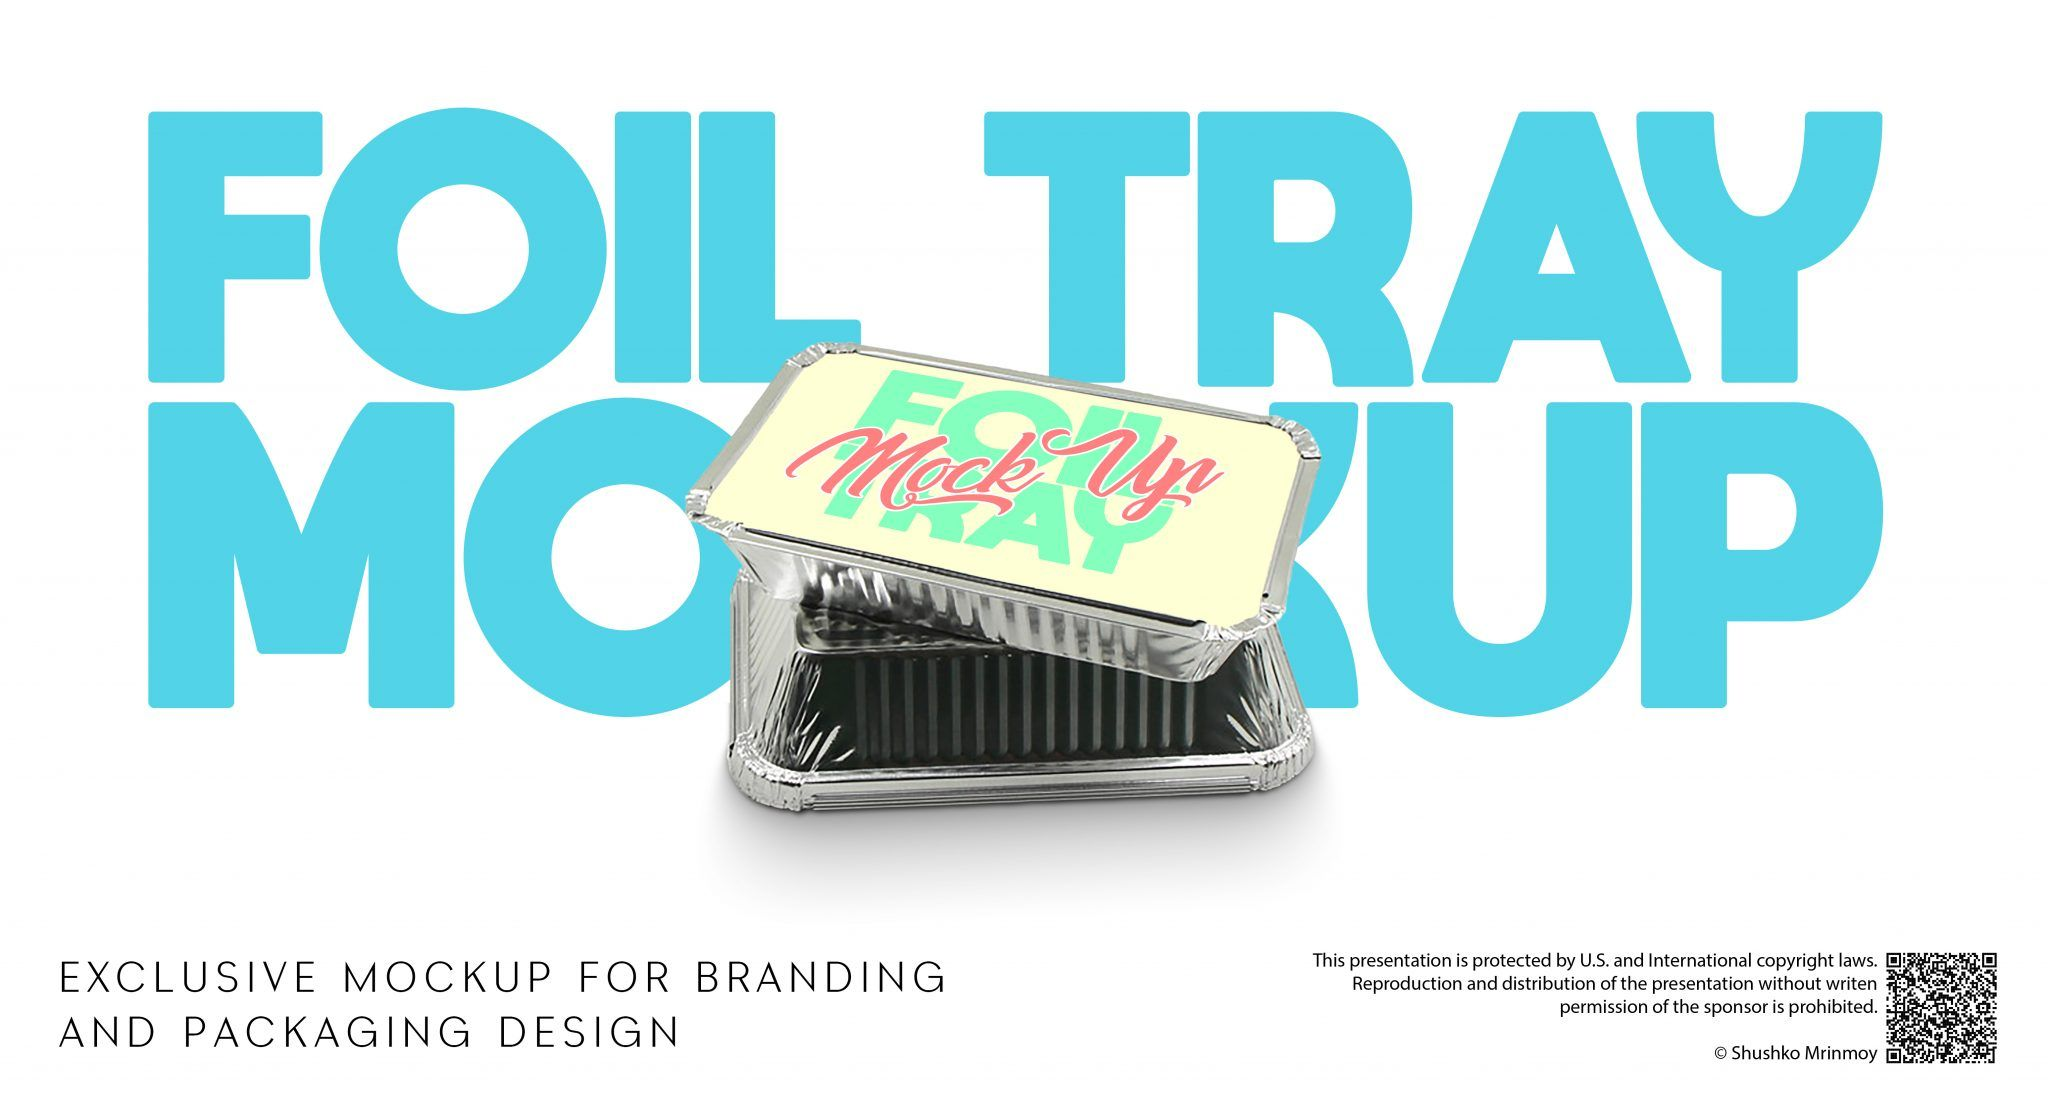 Download Foil Tray Free Mockup Psd In 2021 Free Mockup Mockup Free Psd Mockup